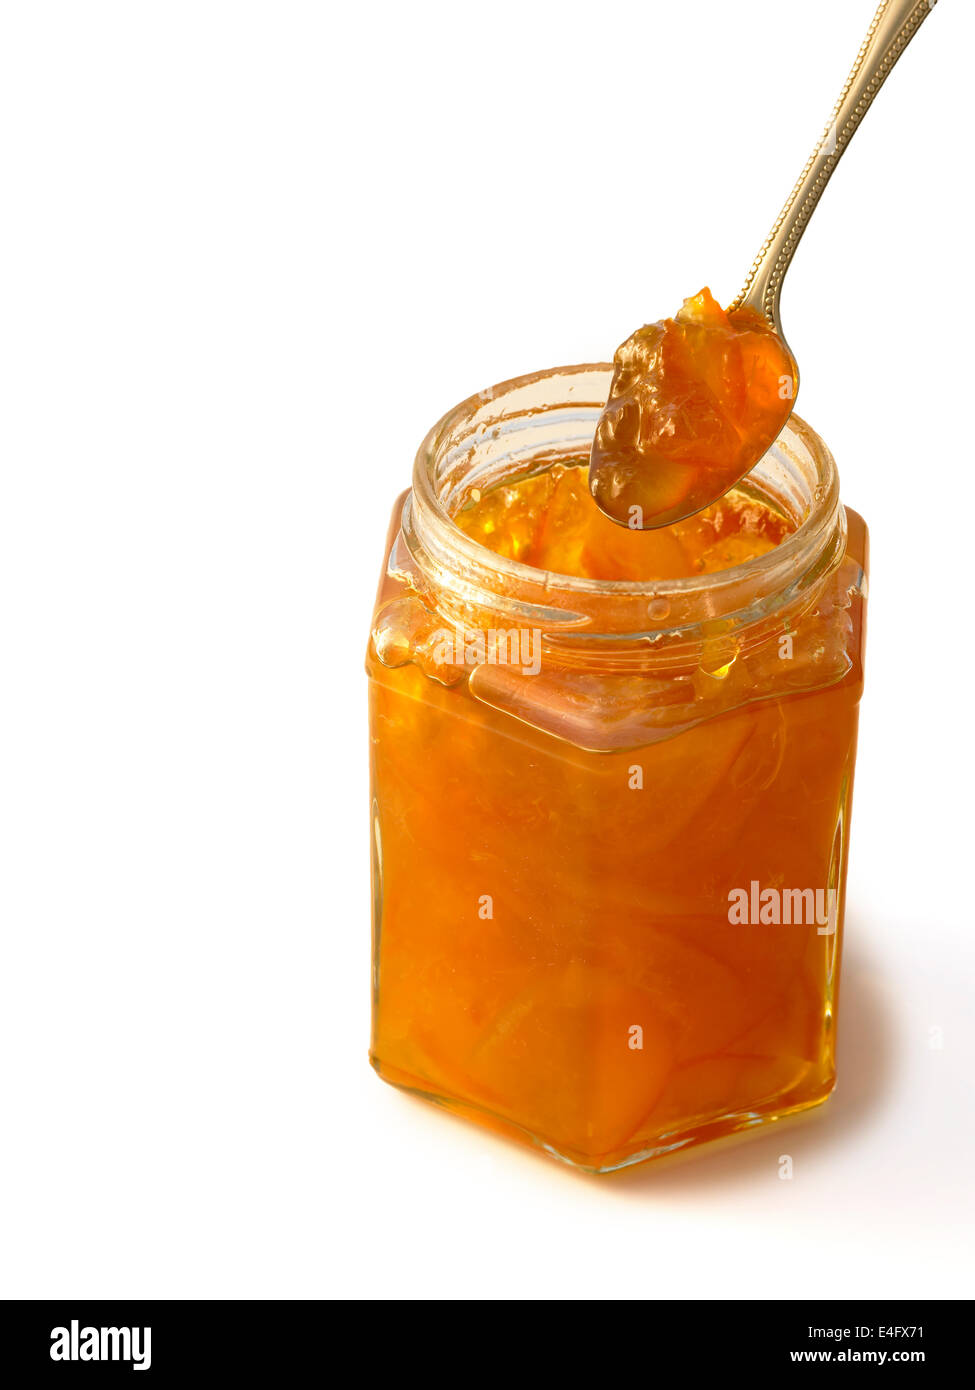 home made marmalade - Stock Image